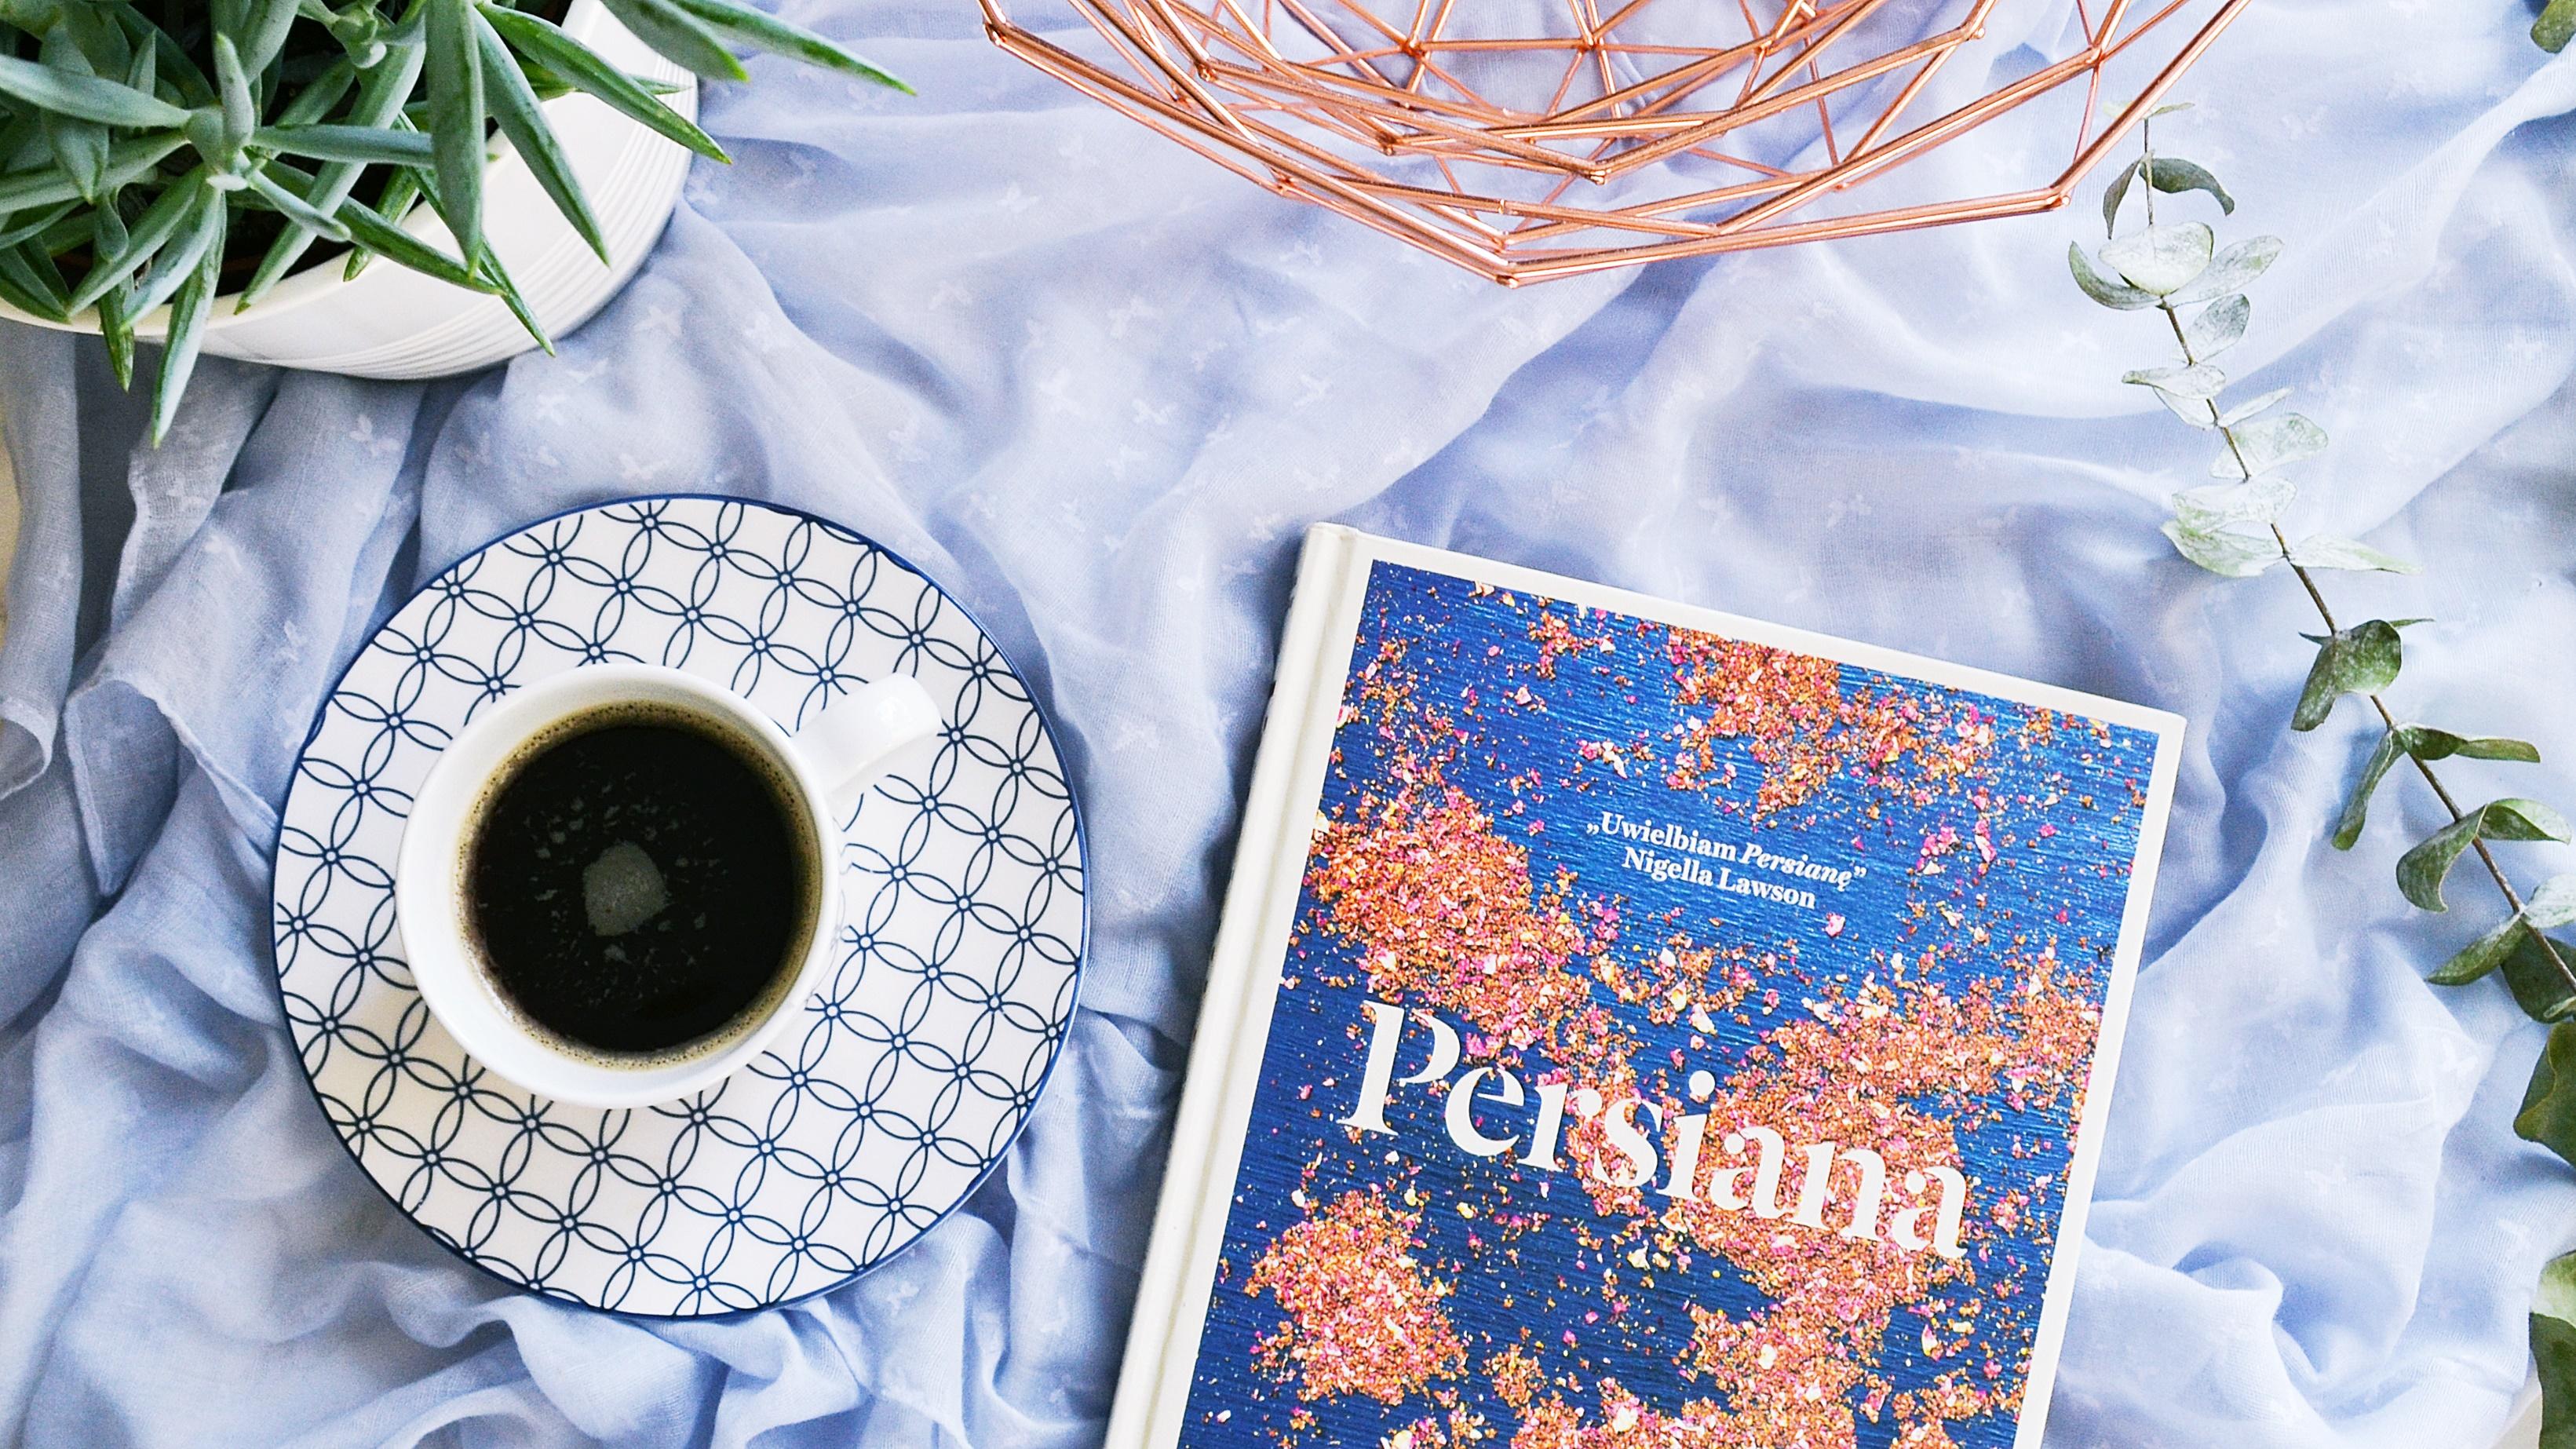 Persiana – pyszna i prosta kuchnia Bliskiego Wschodu?